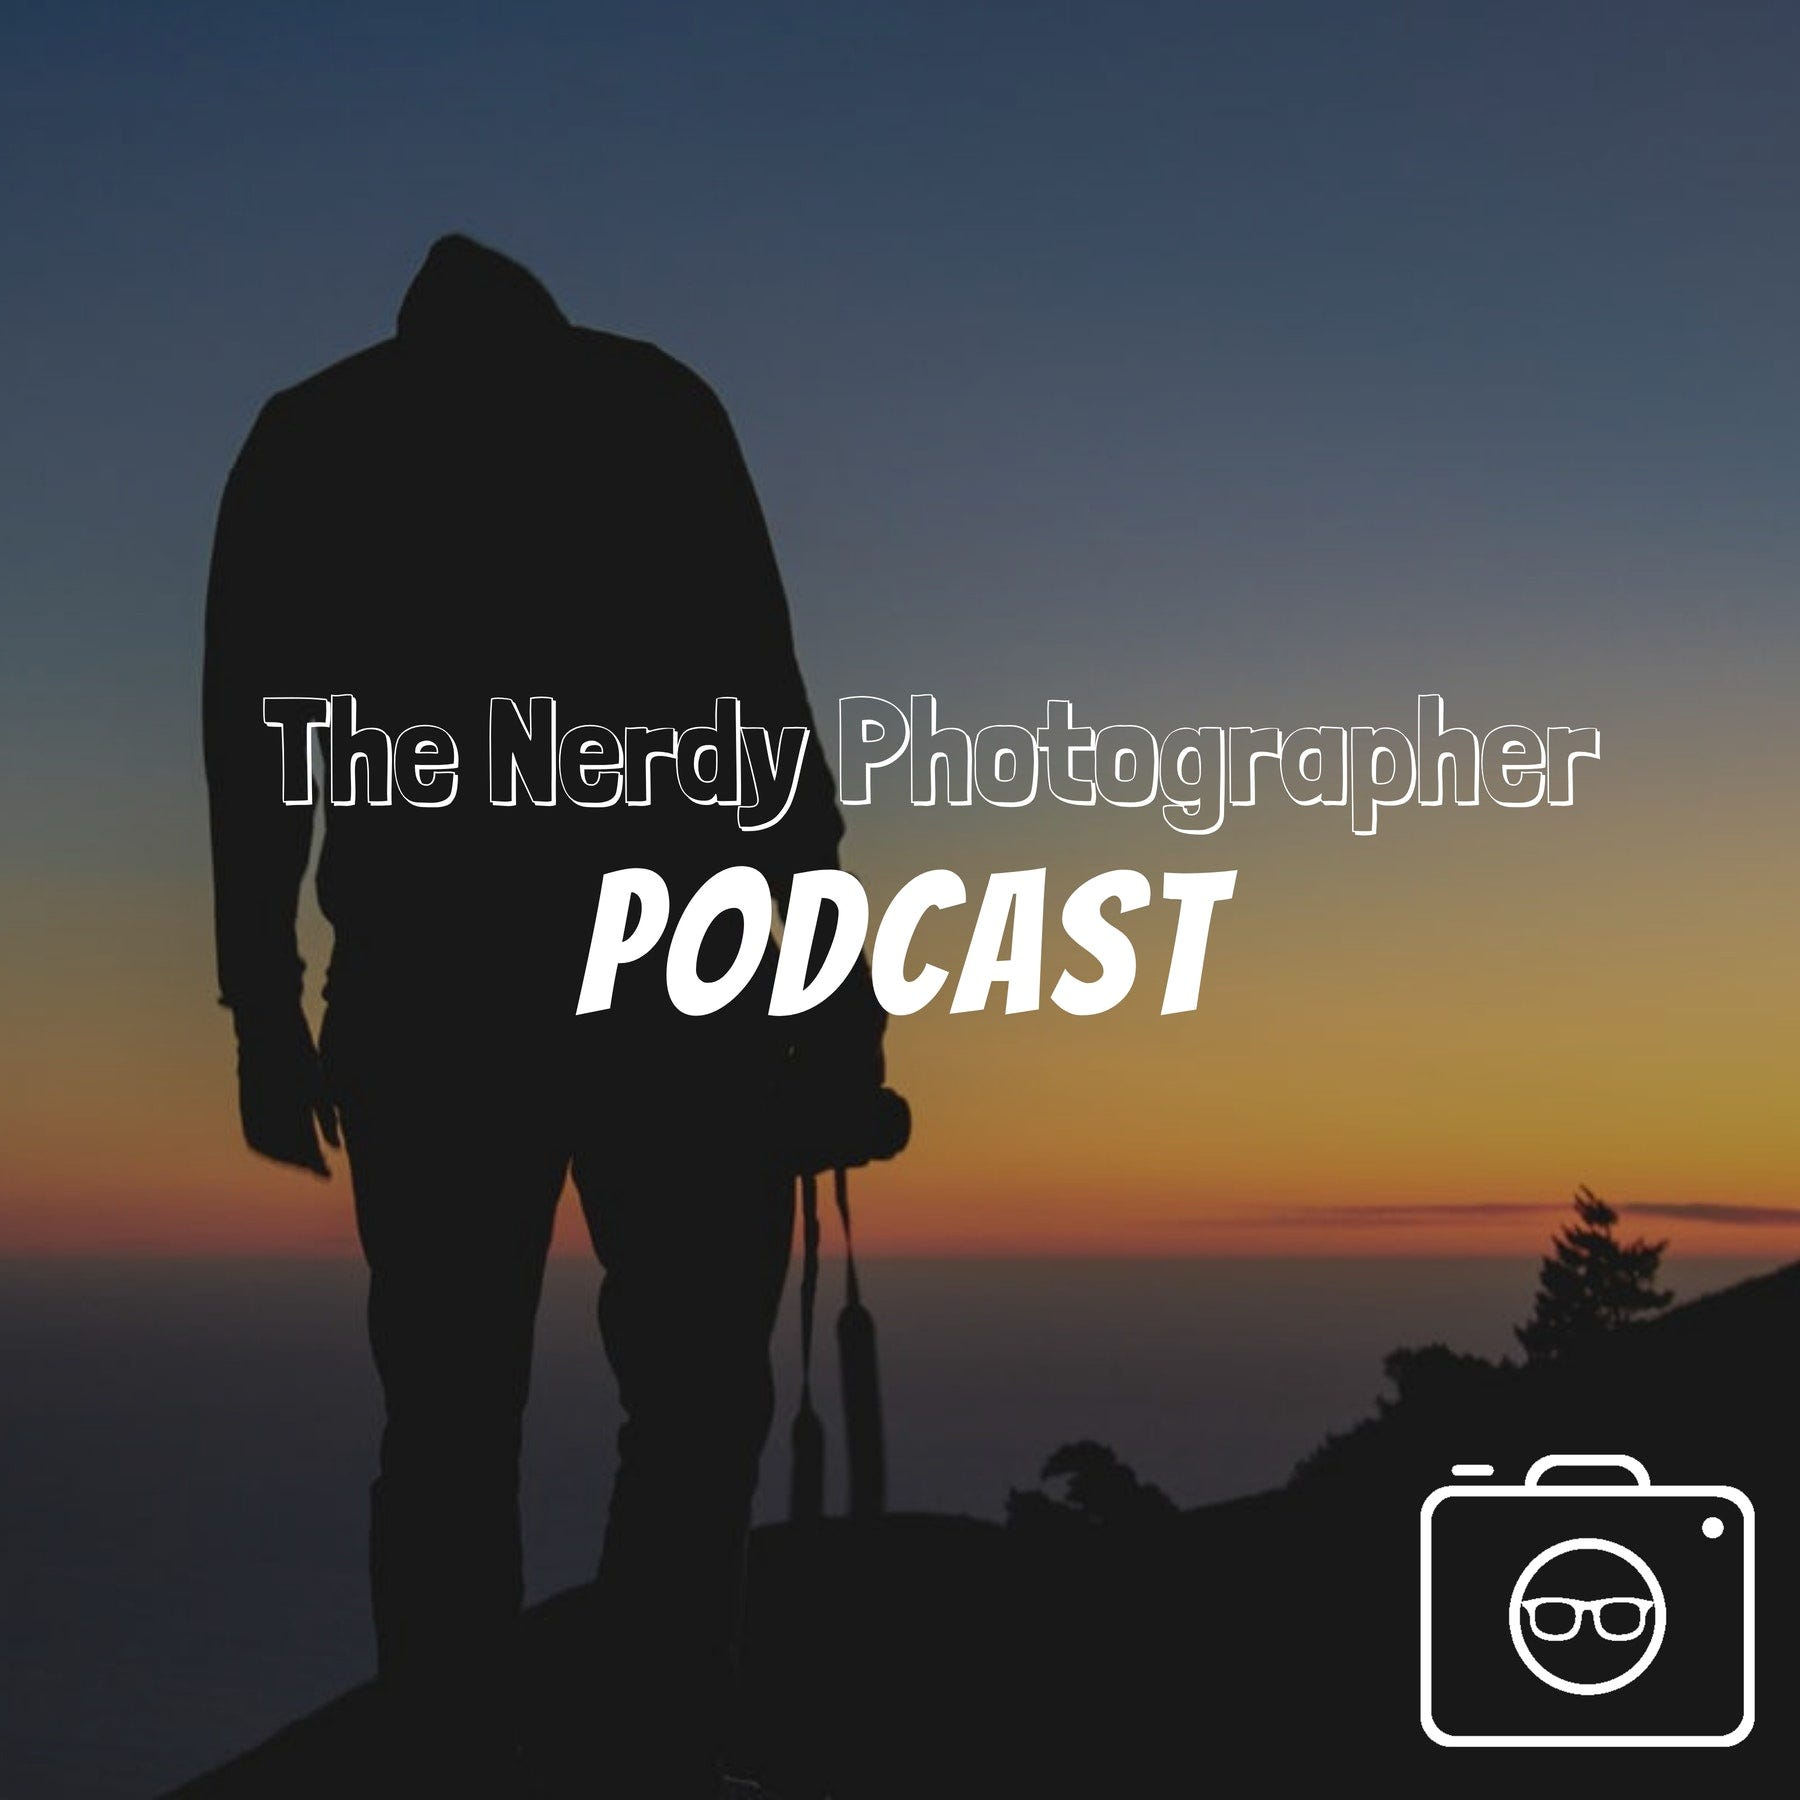 The Nerdy Photographer Podcast